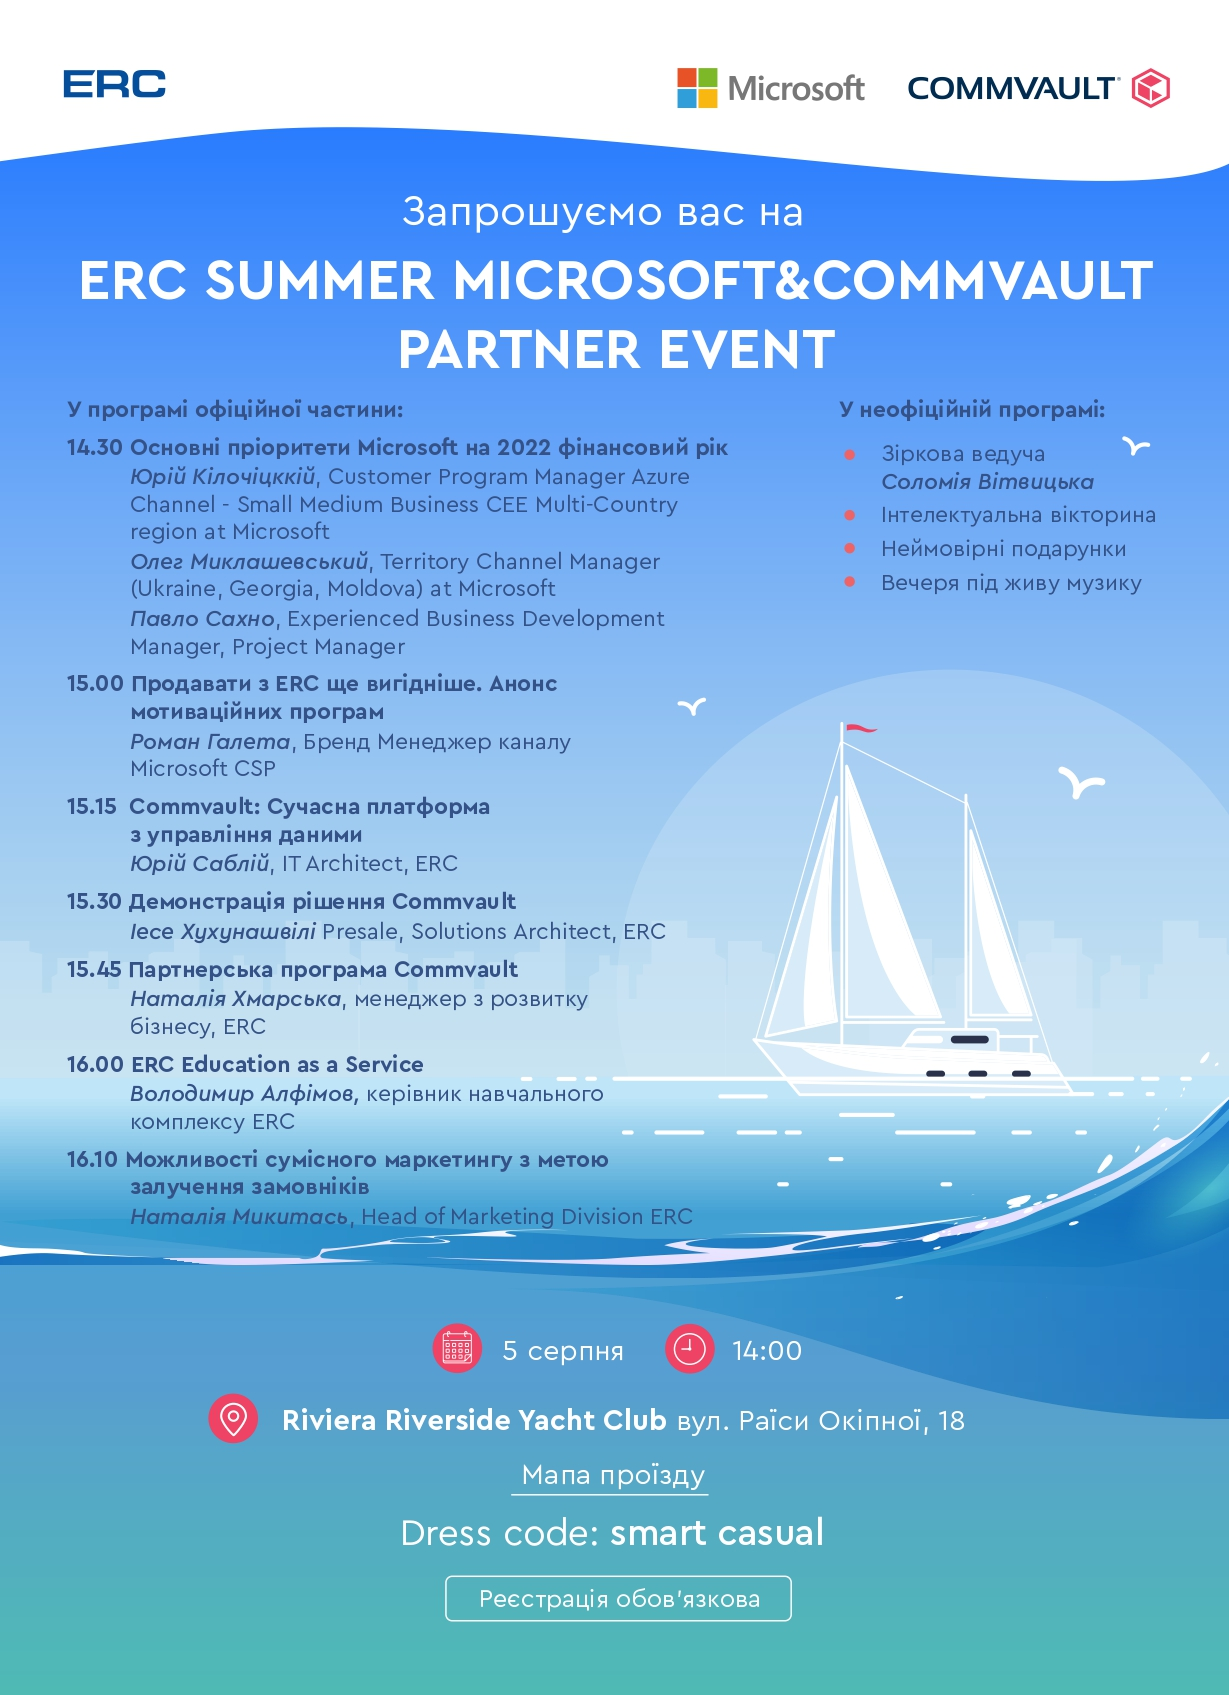 ERC Summer Microsoft&Commvault Partner Event